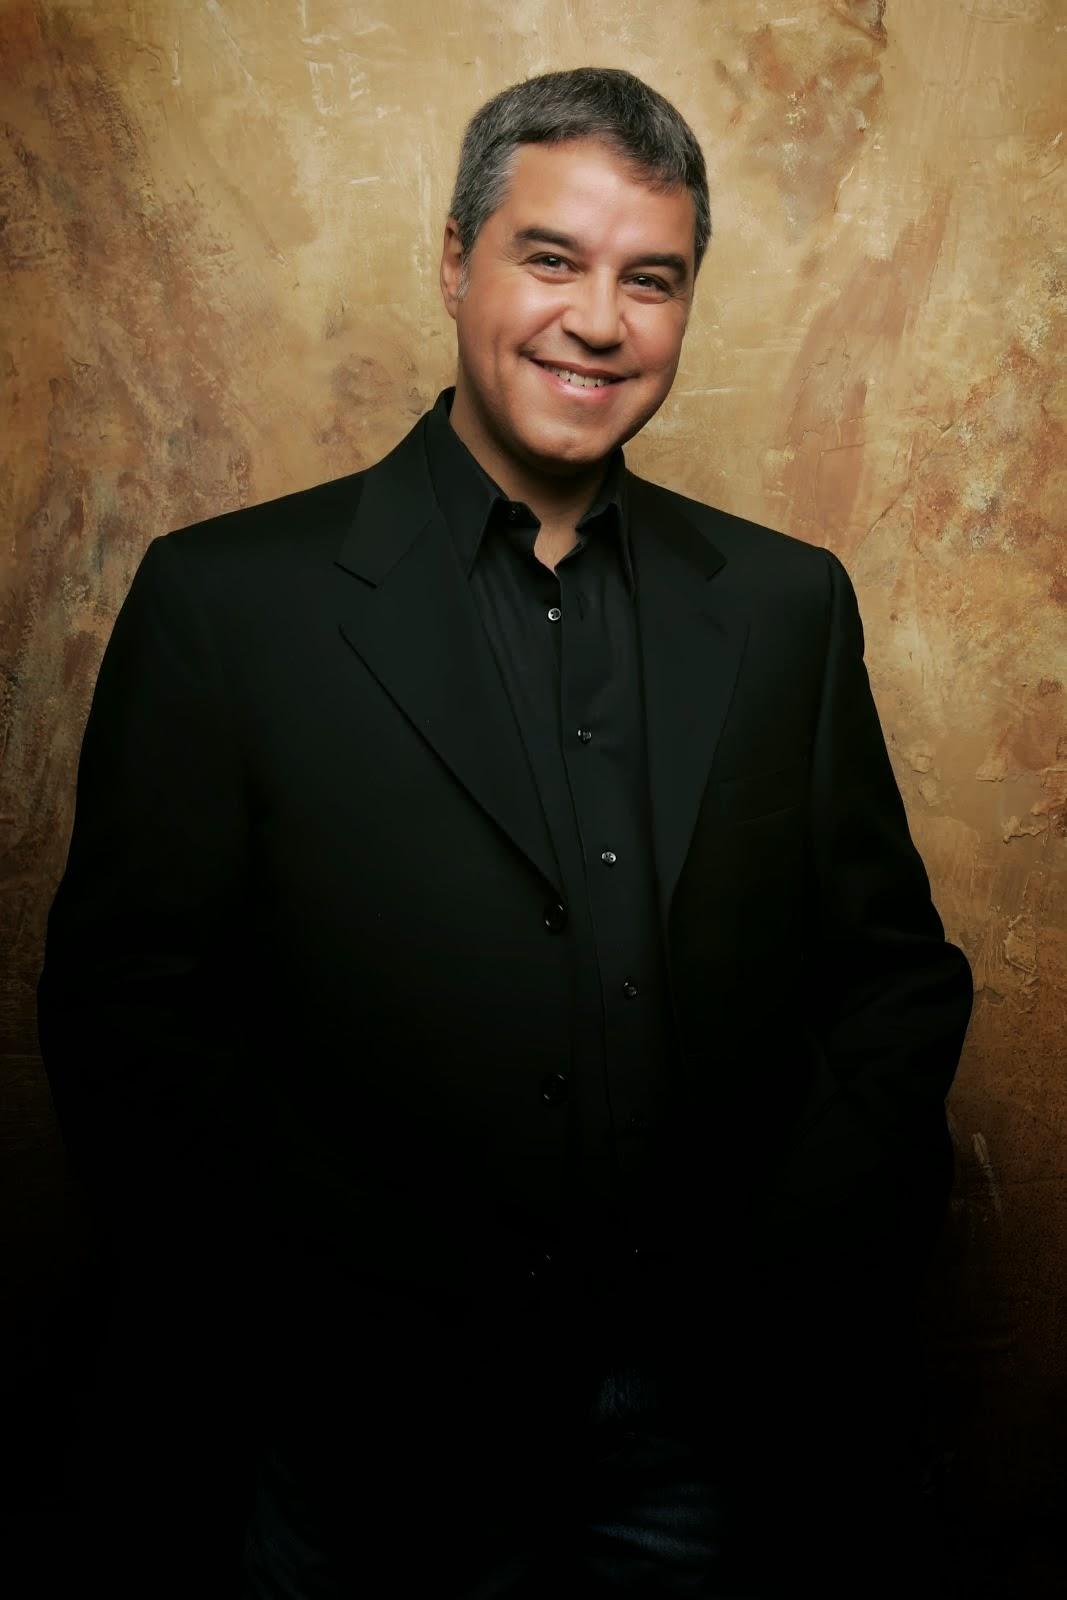 Lucio Fernandez